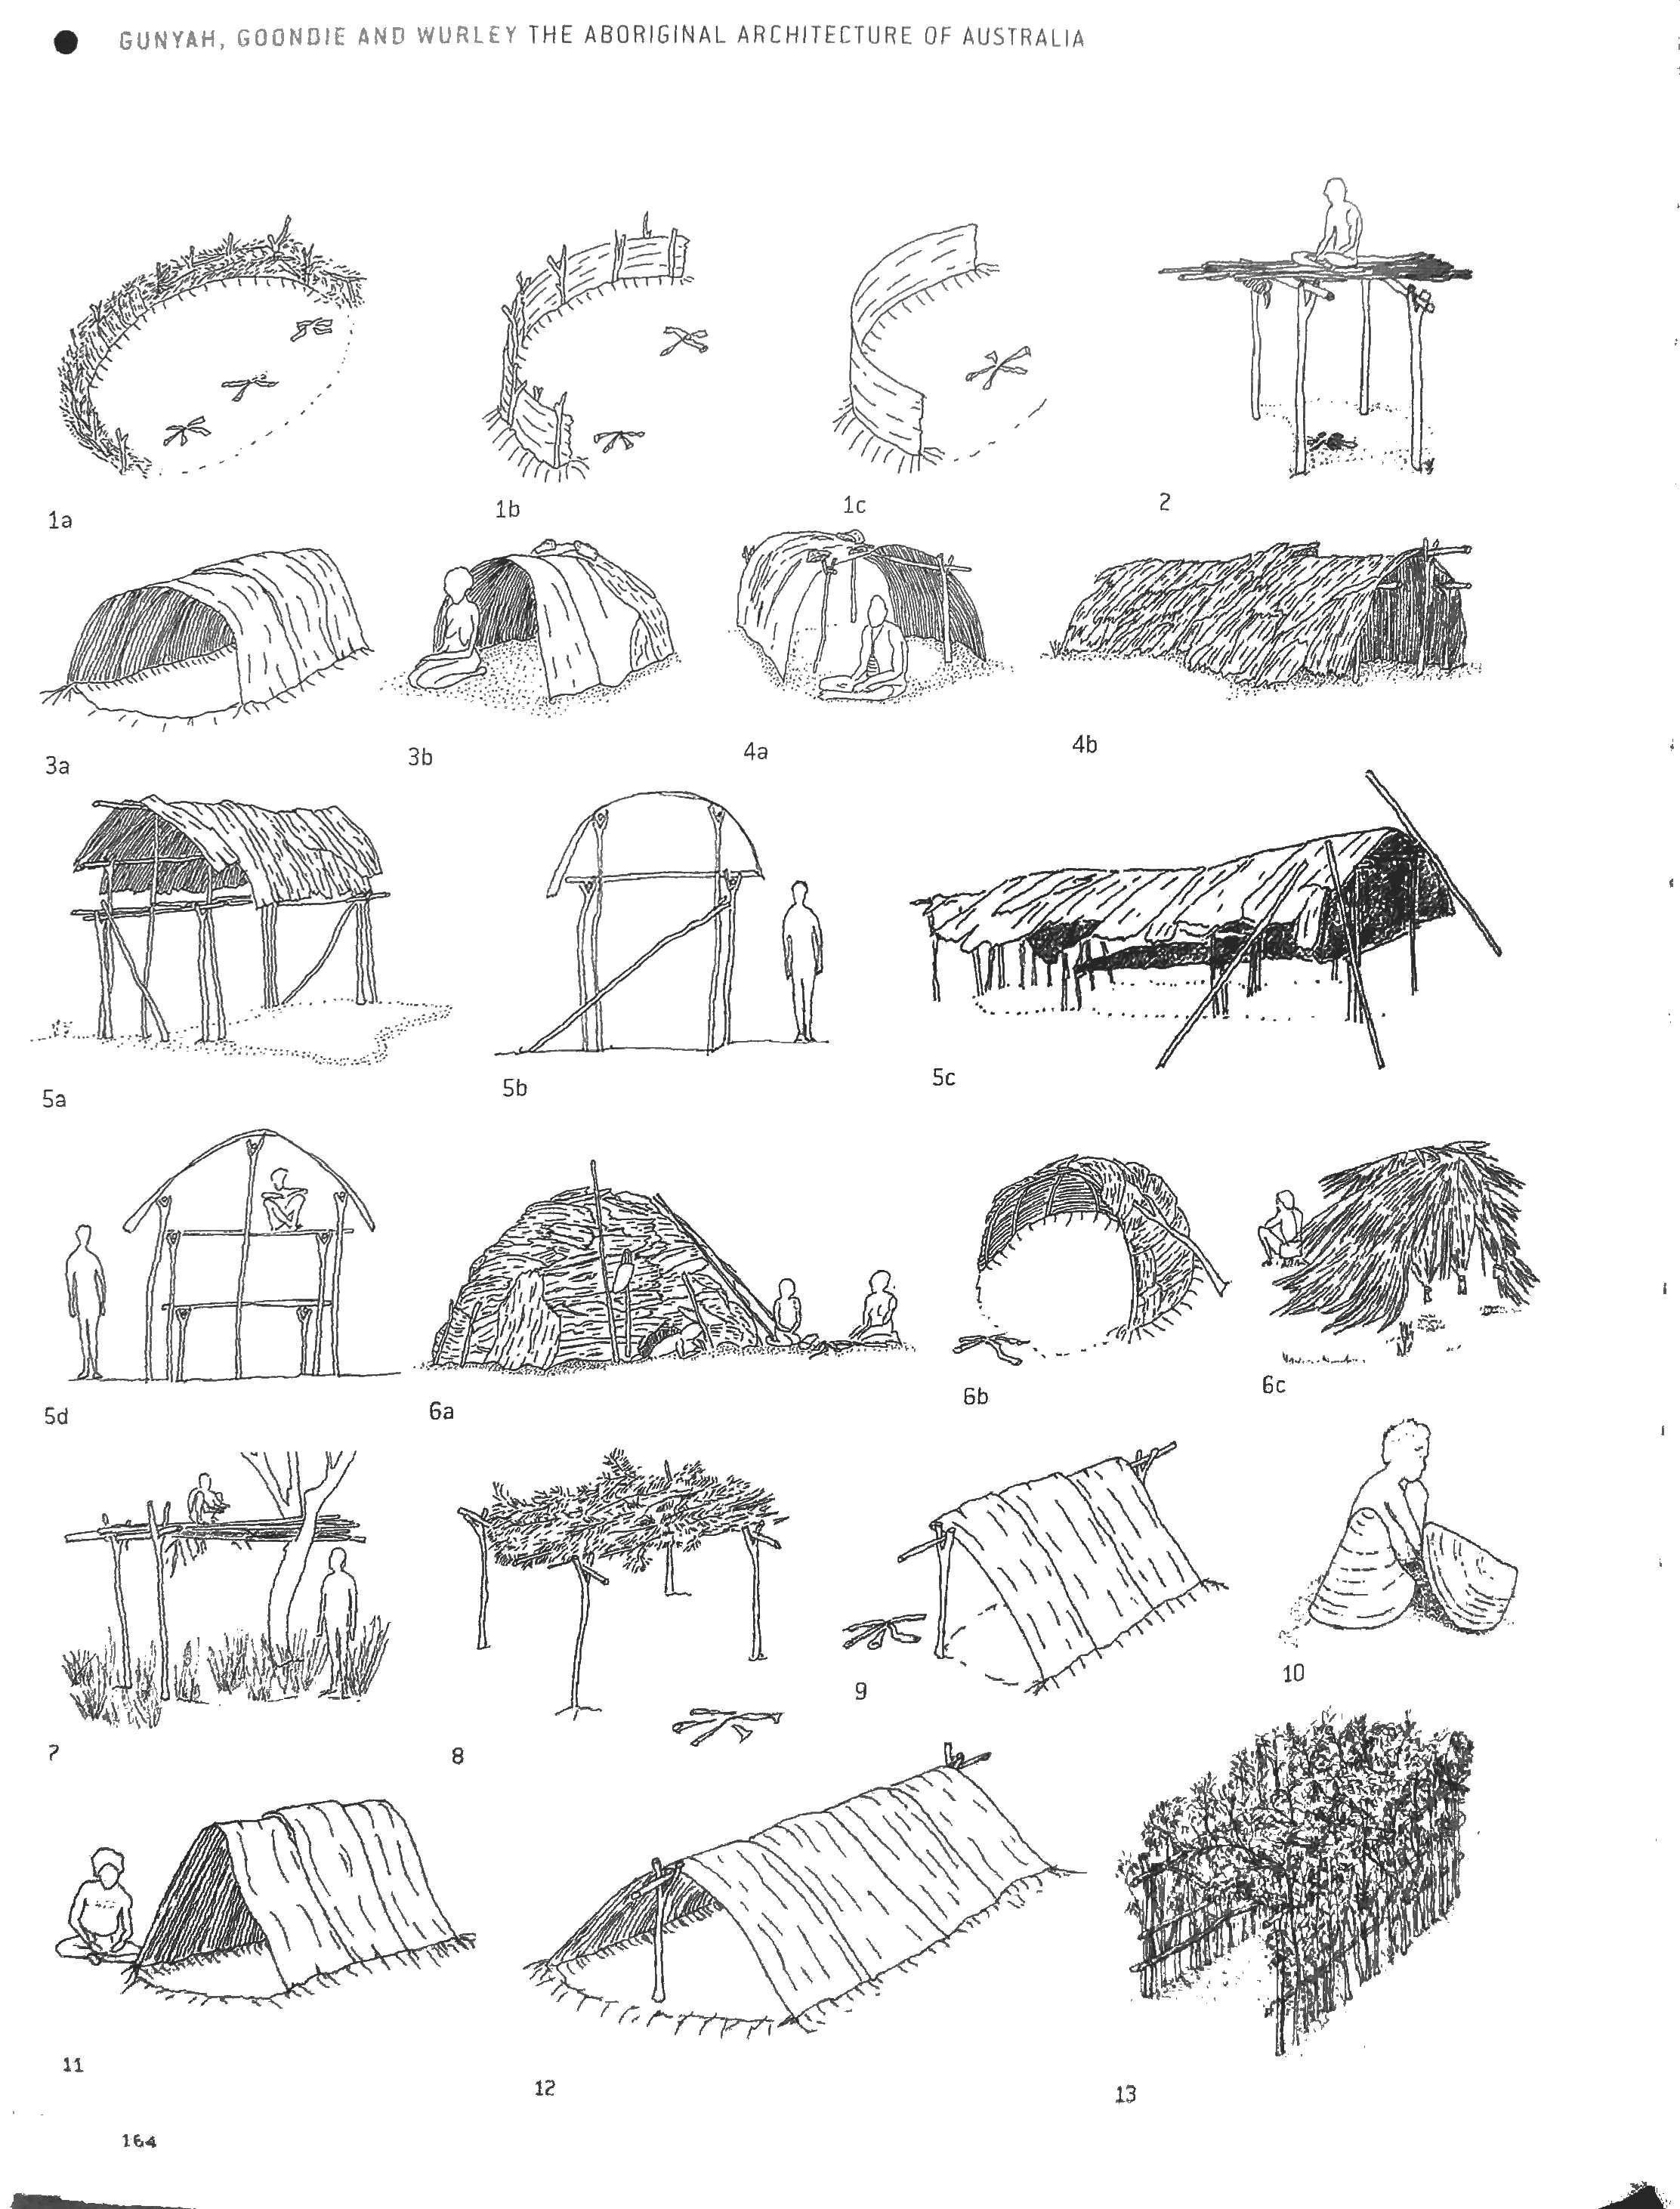 Examples of different variations of seasonal structures from Paul Memmott's Gunyah, Goondie & Wurley. A fantastic resource!